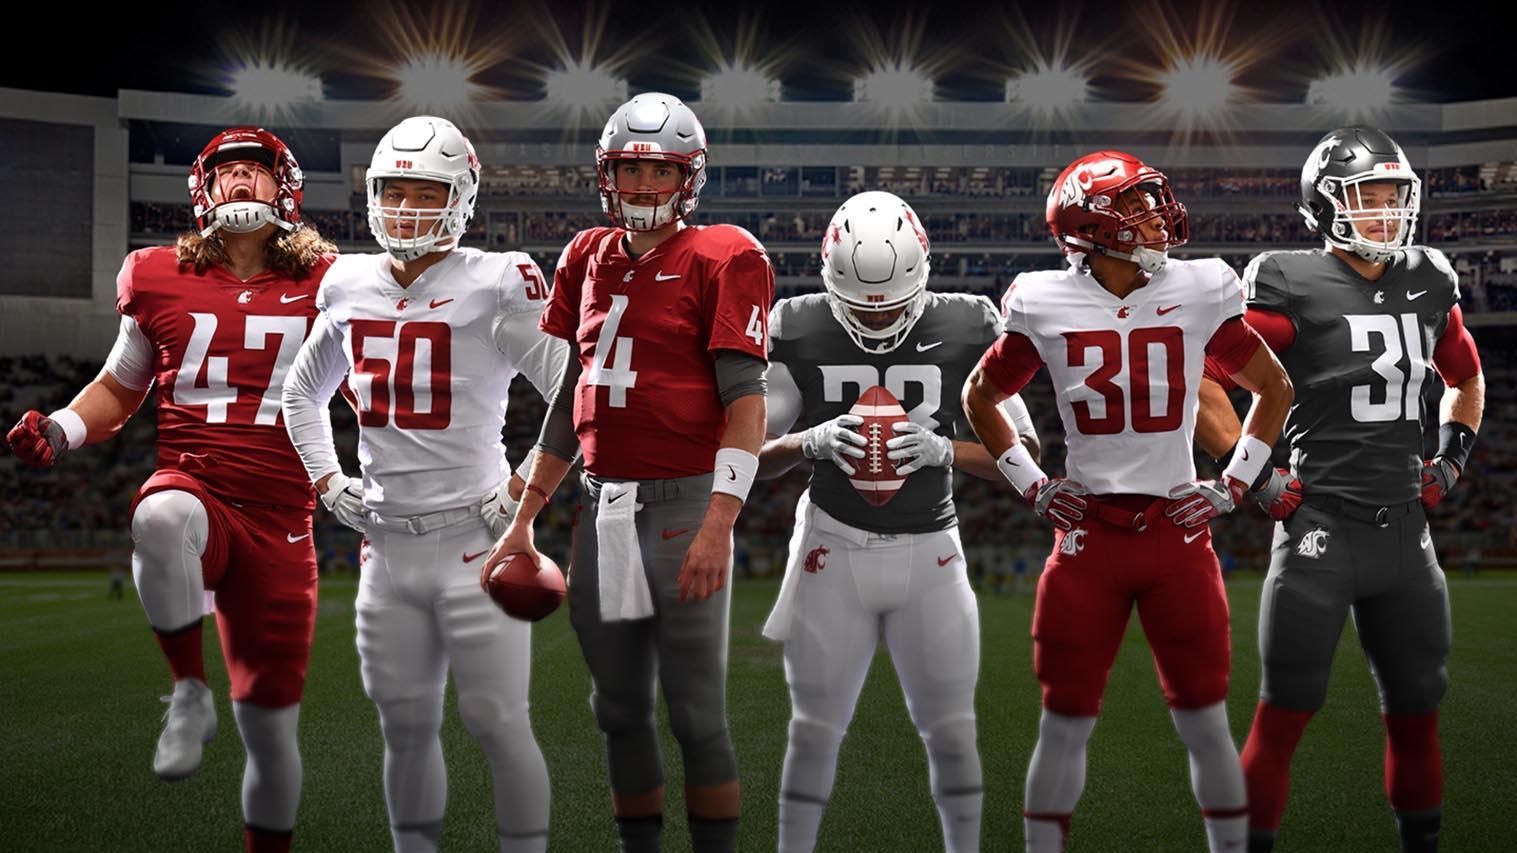 hot sale online 81804 cb82d Washington State unveils new football uniforms for 2017 ...